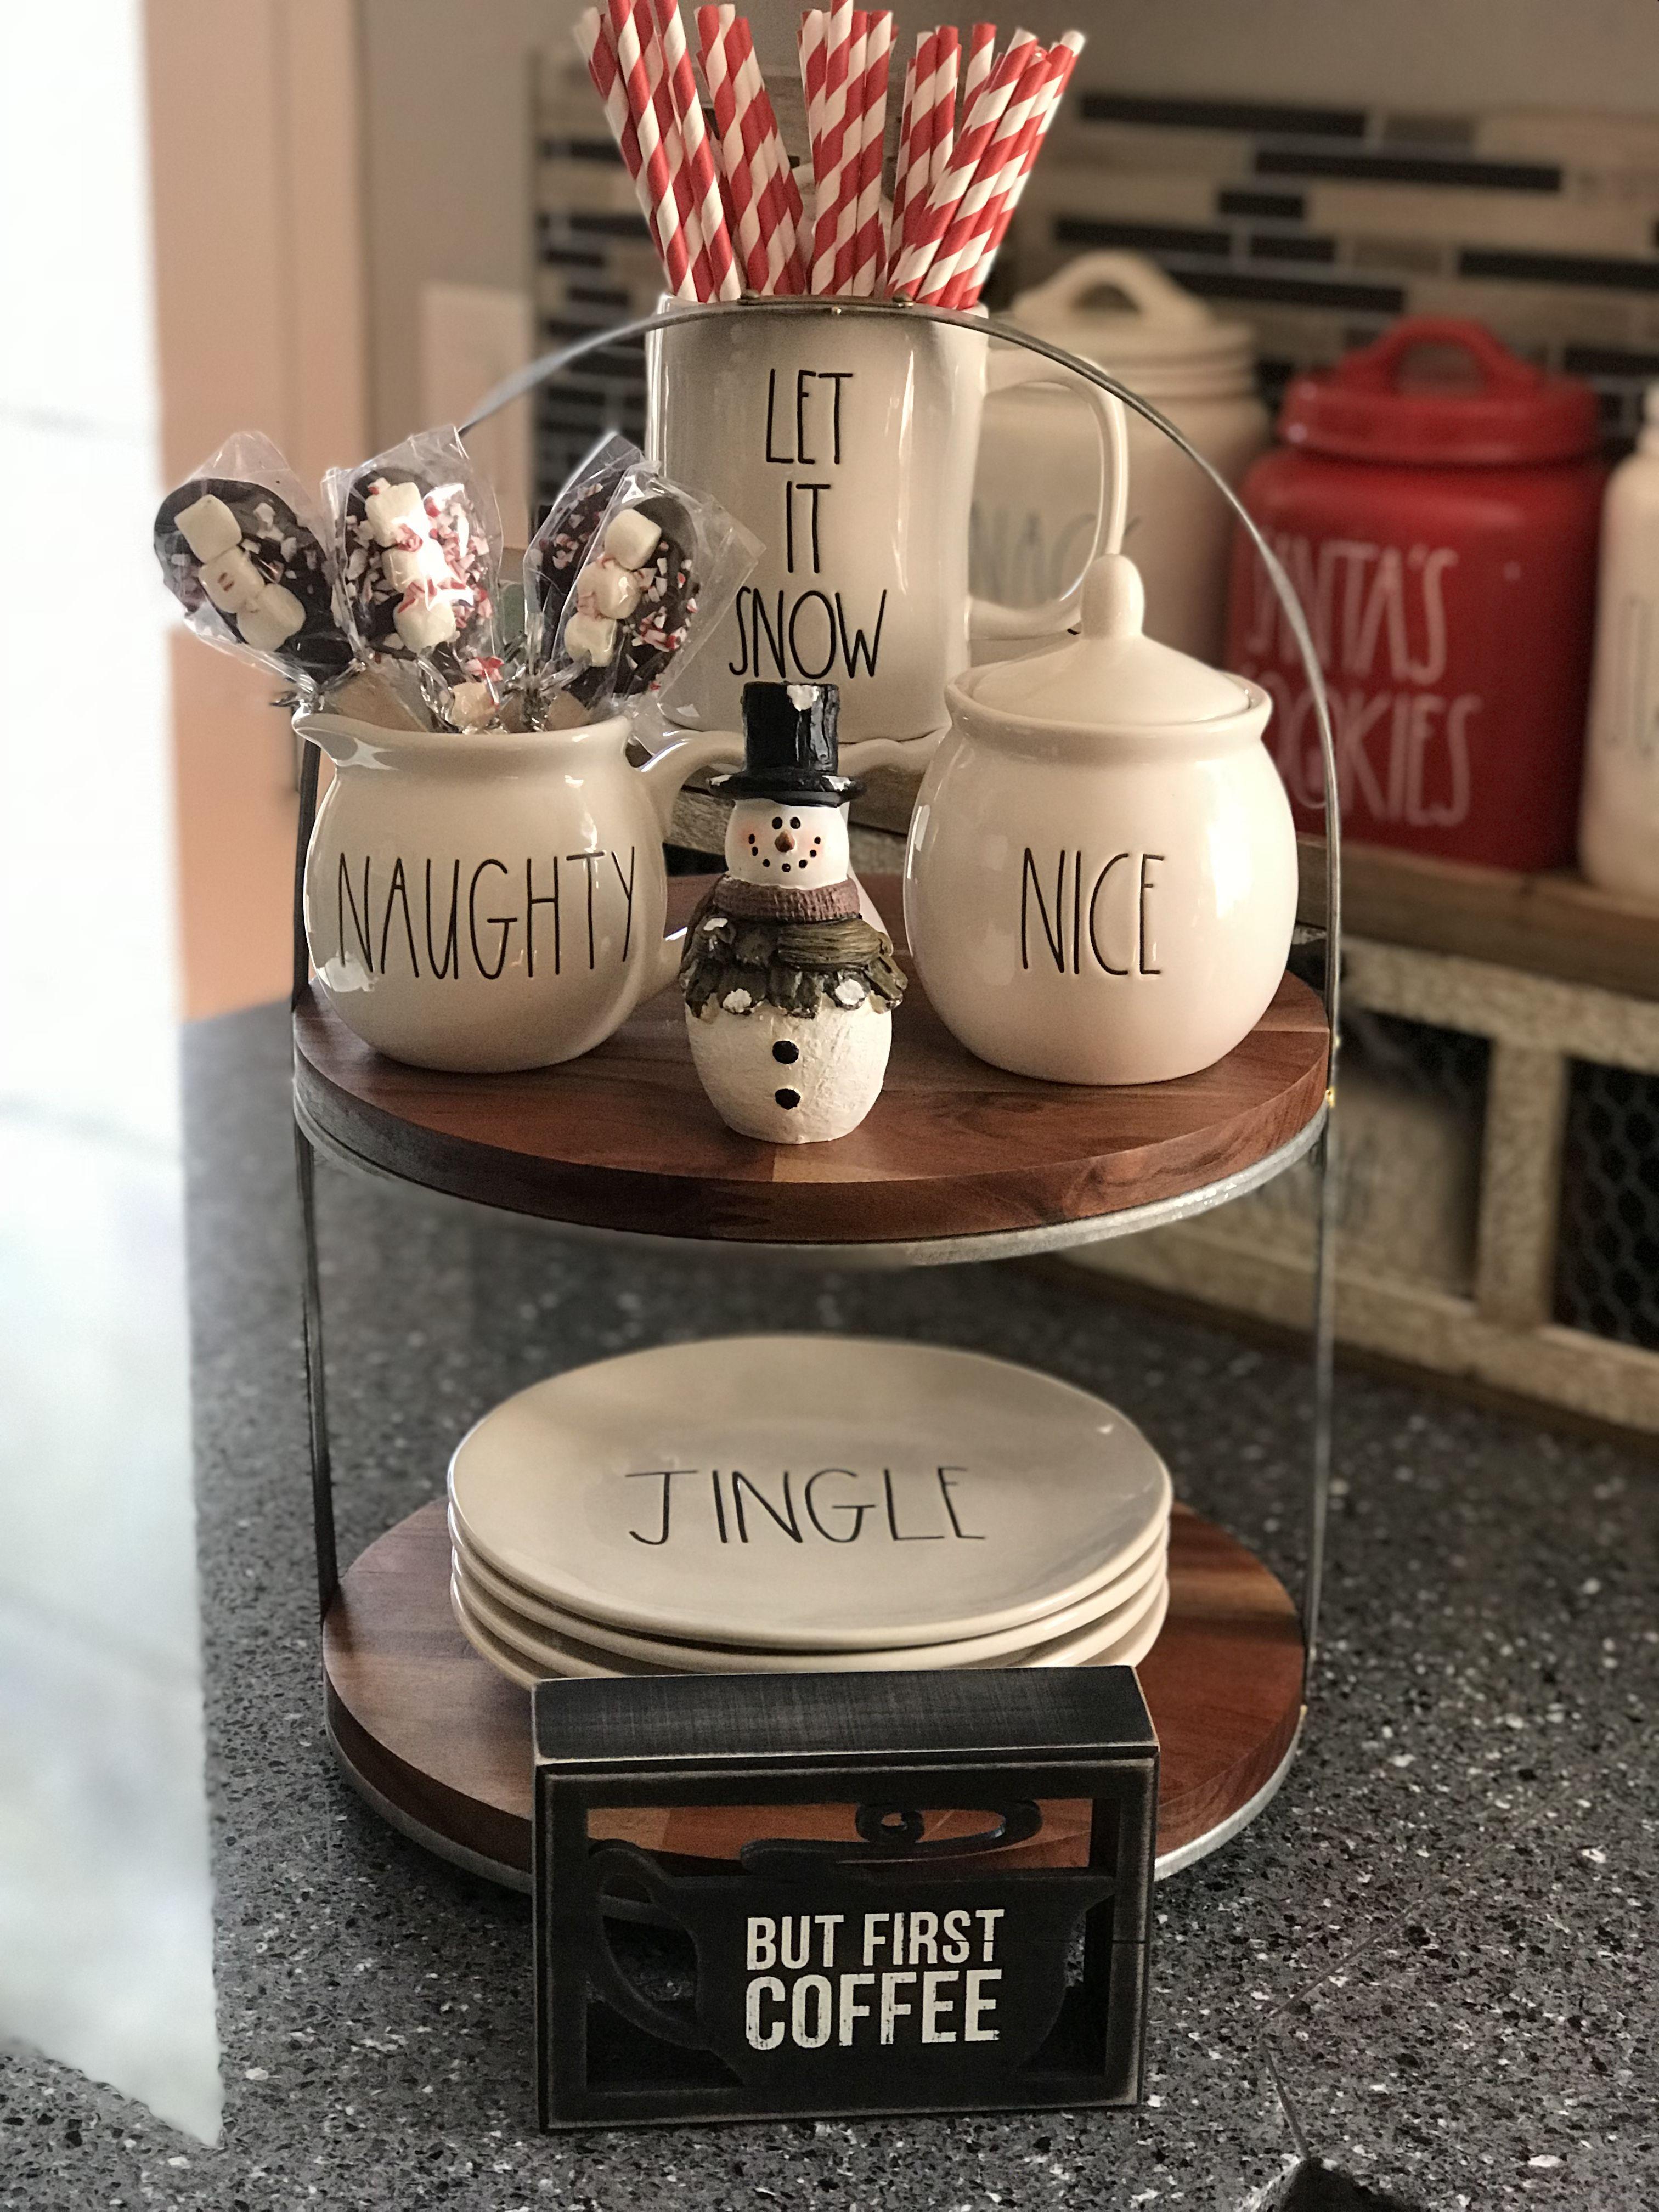 Image by angelina osti on rae dunn display cake stand